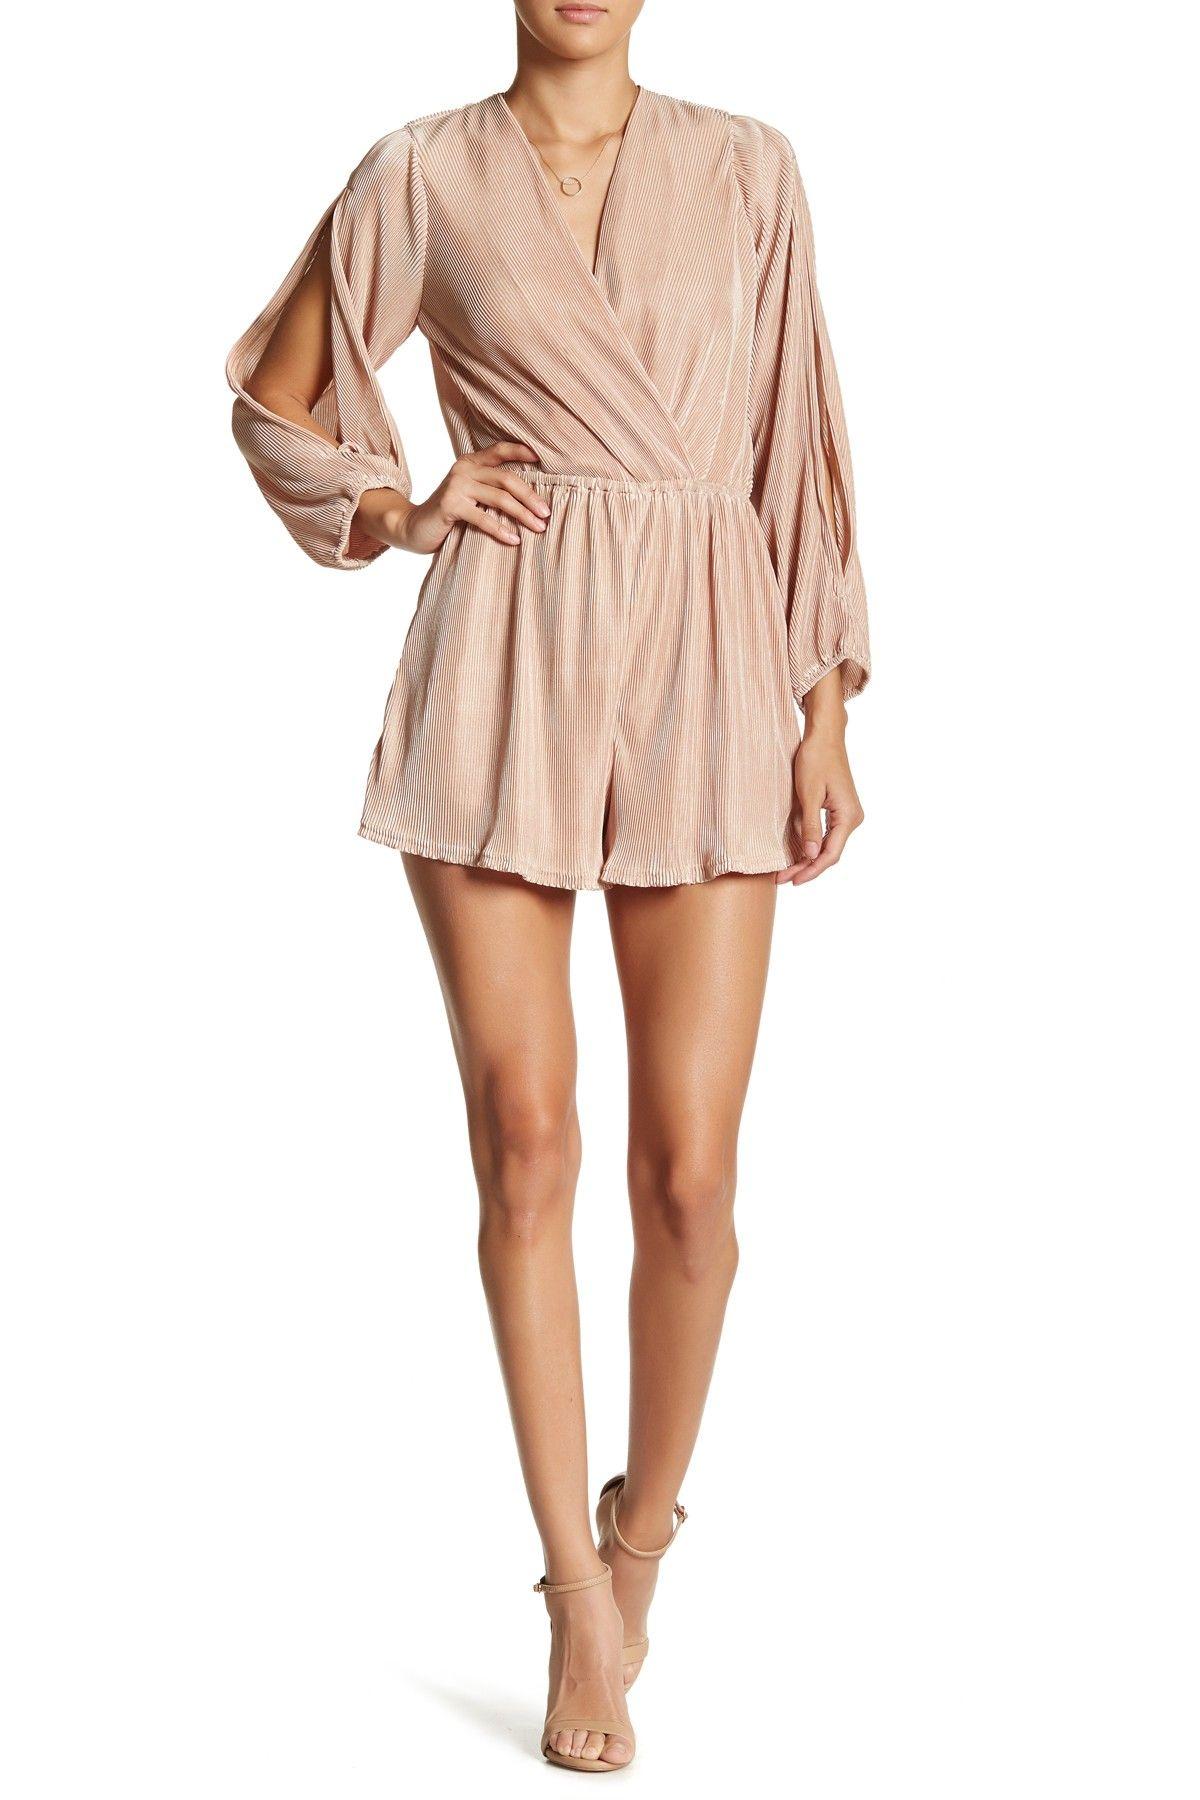 #REVOLVE   Long sleeve playsuit, Stella dress, Dresses